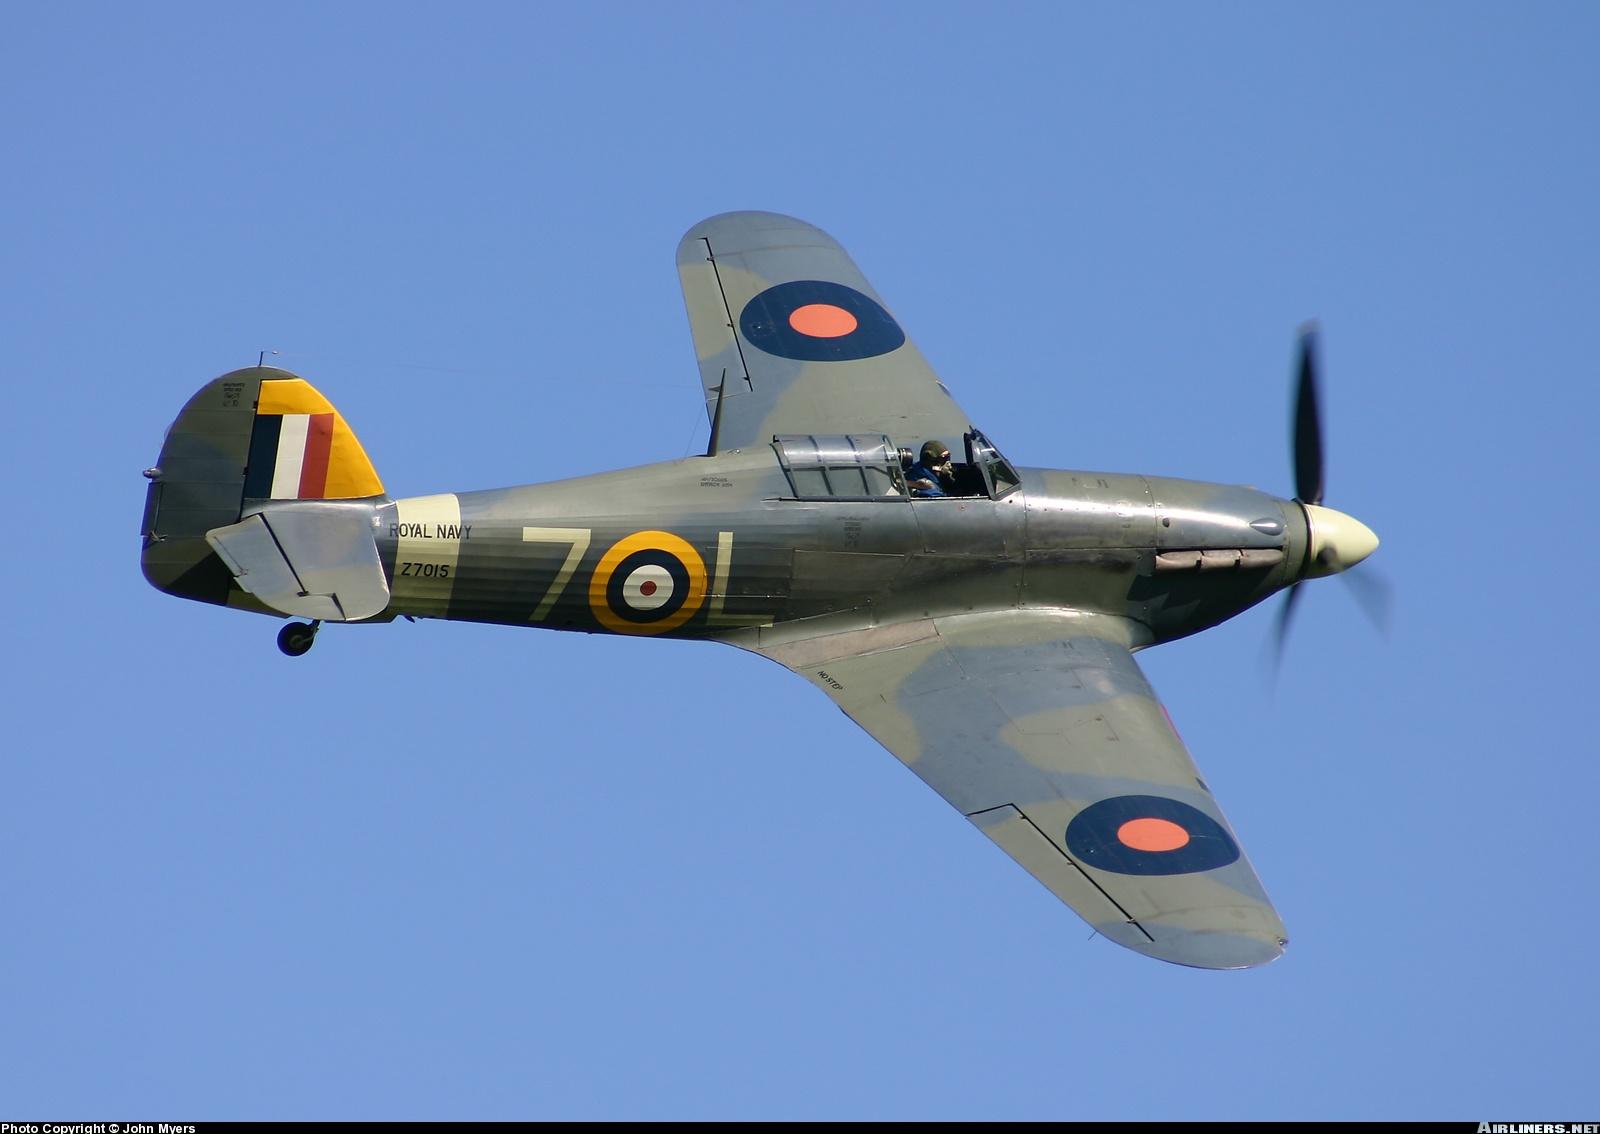 Airworthy Warbird Hawker Hurricane IIc RN 800NAS 7L Z7015 registered G BKTH 15